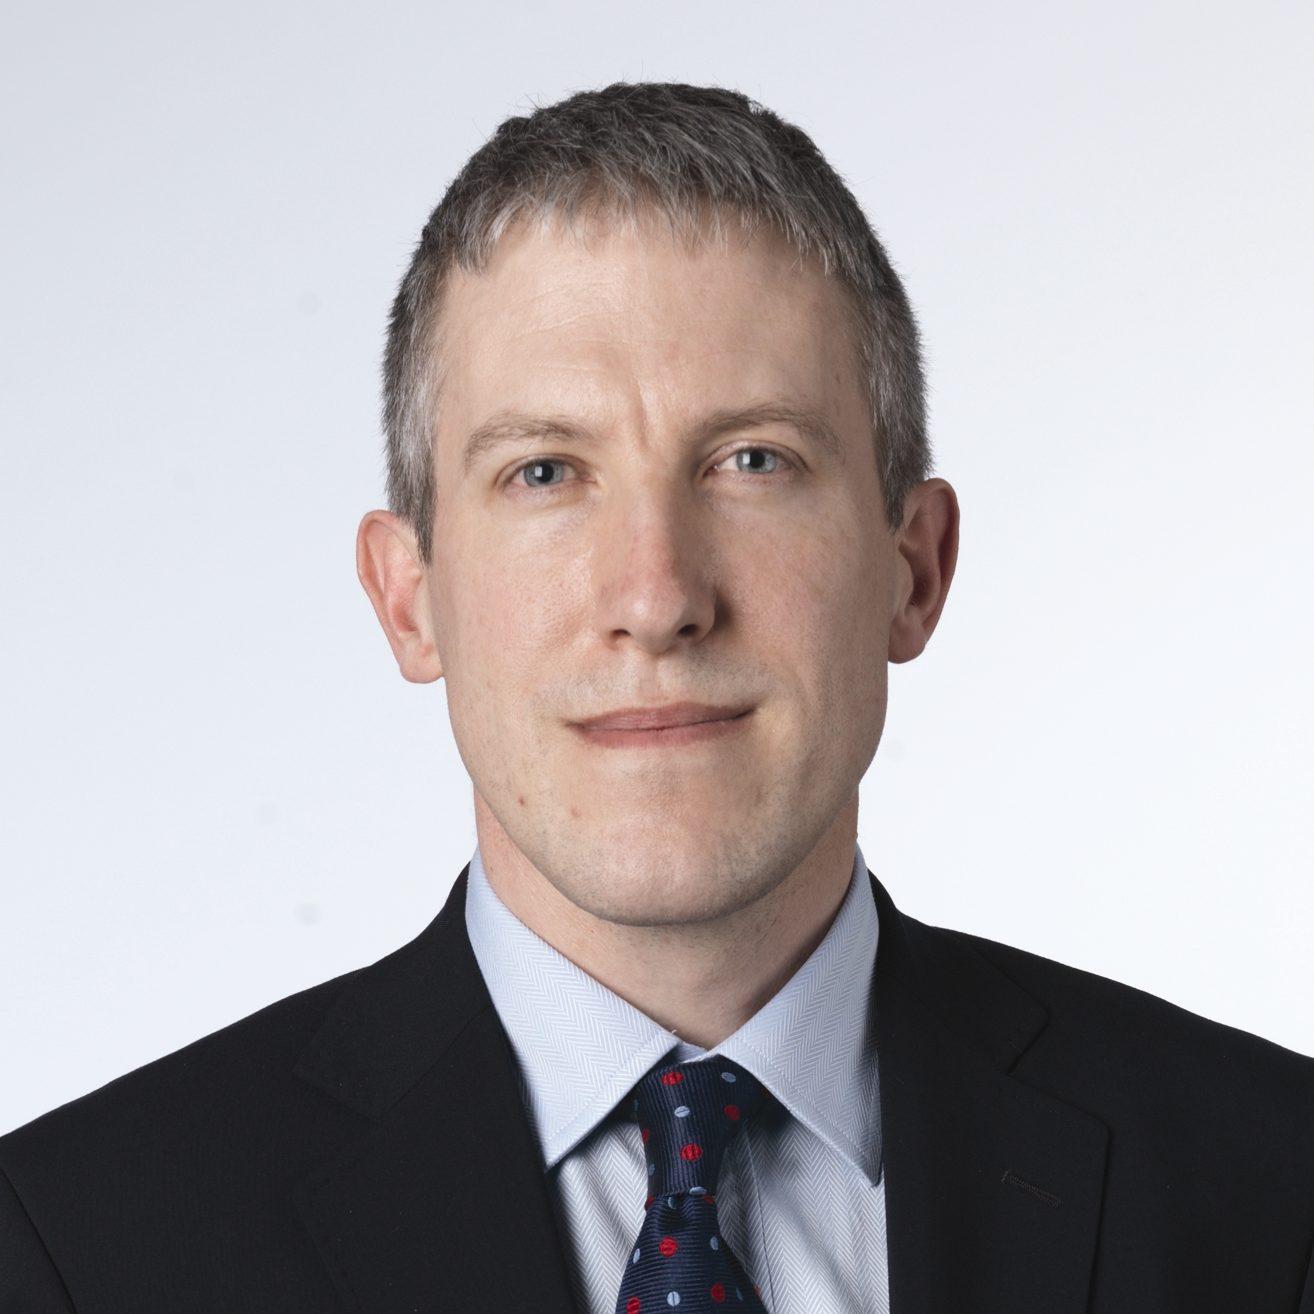 Andrew Baddeley-Chappell